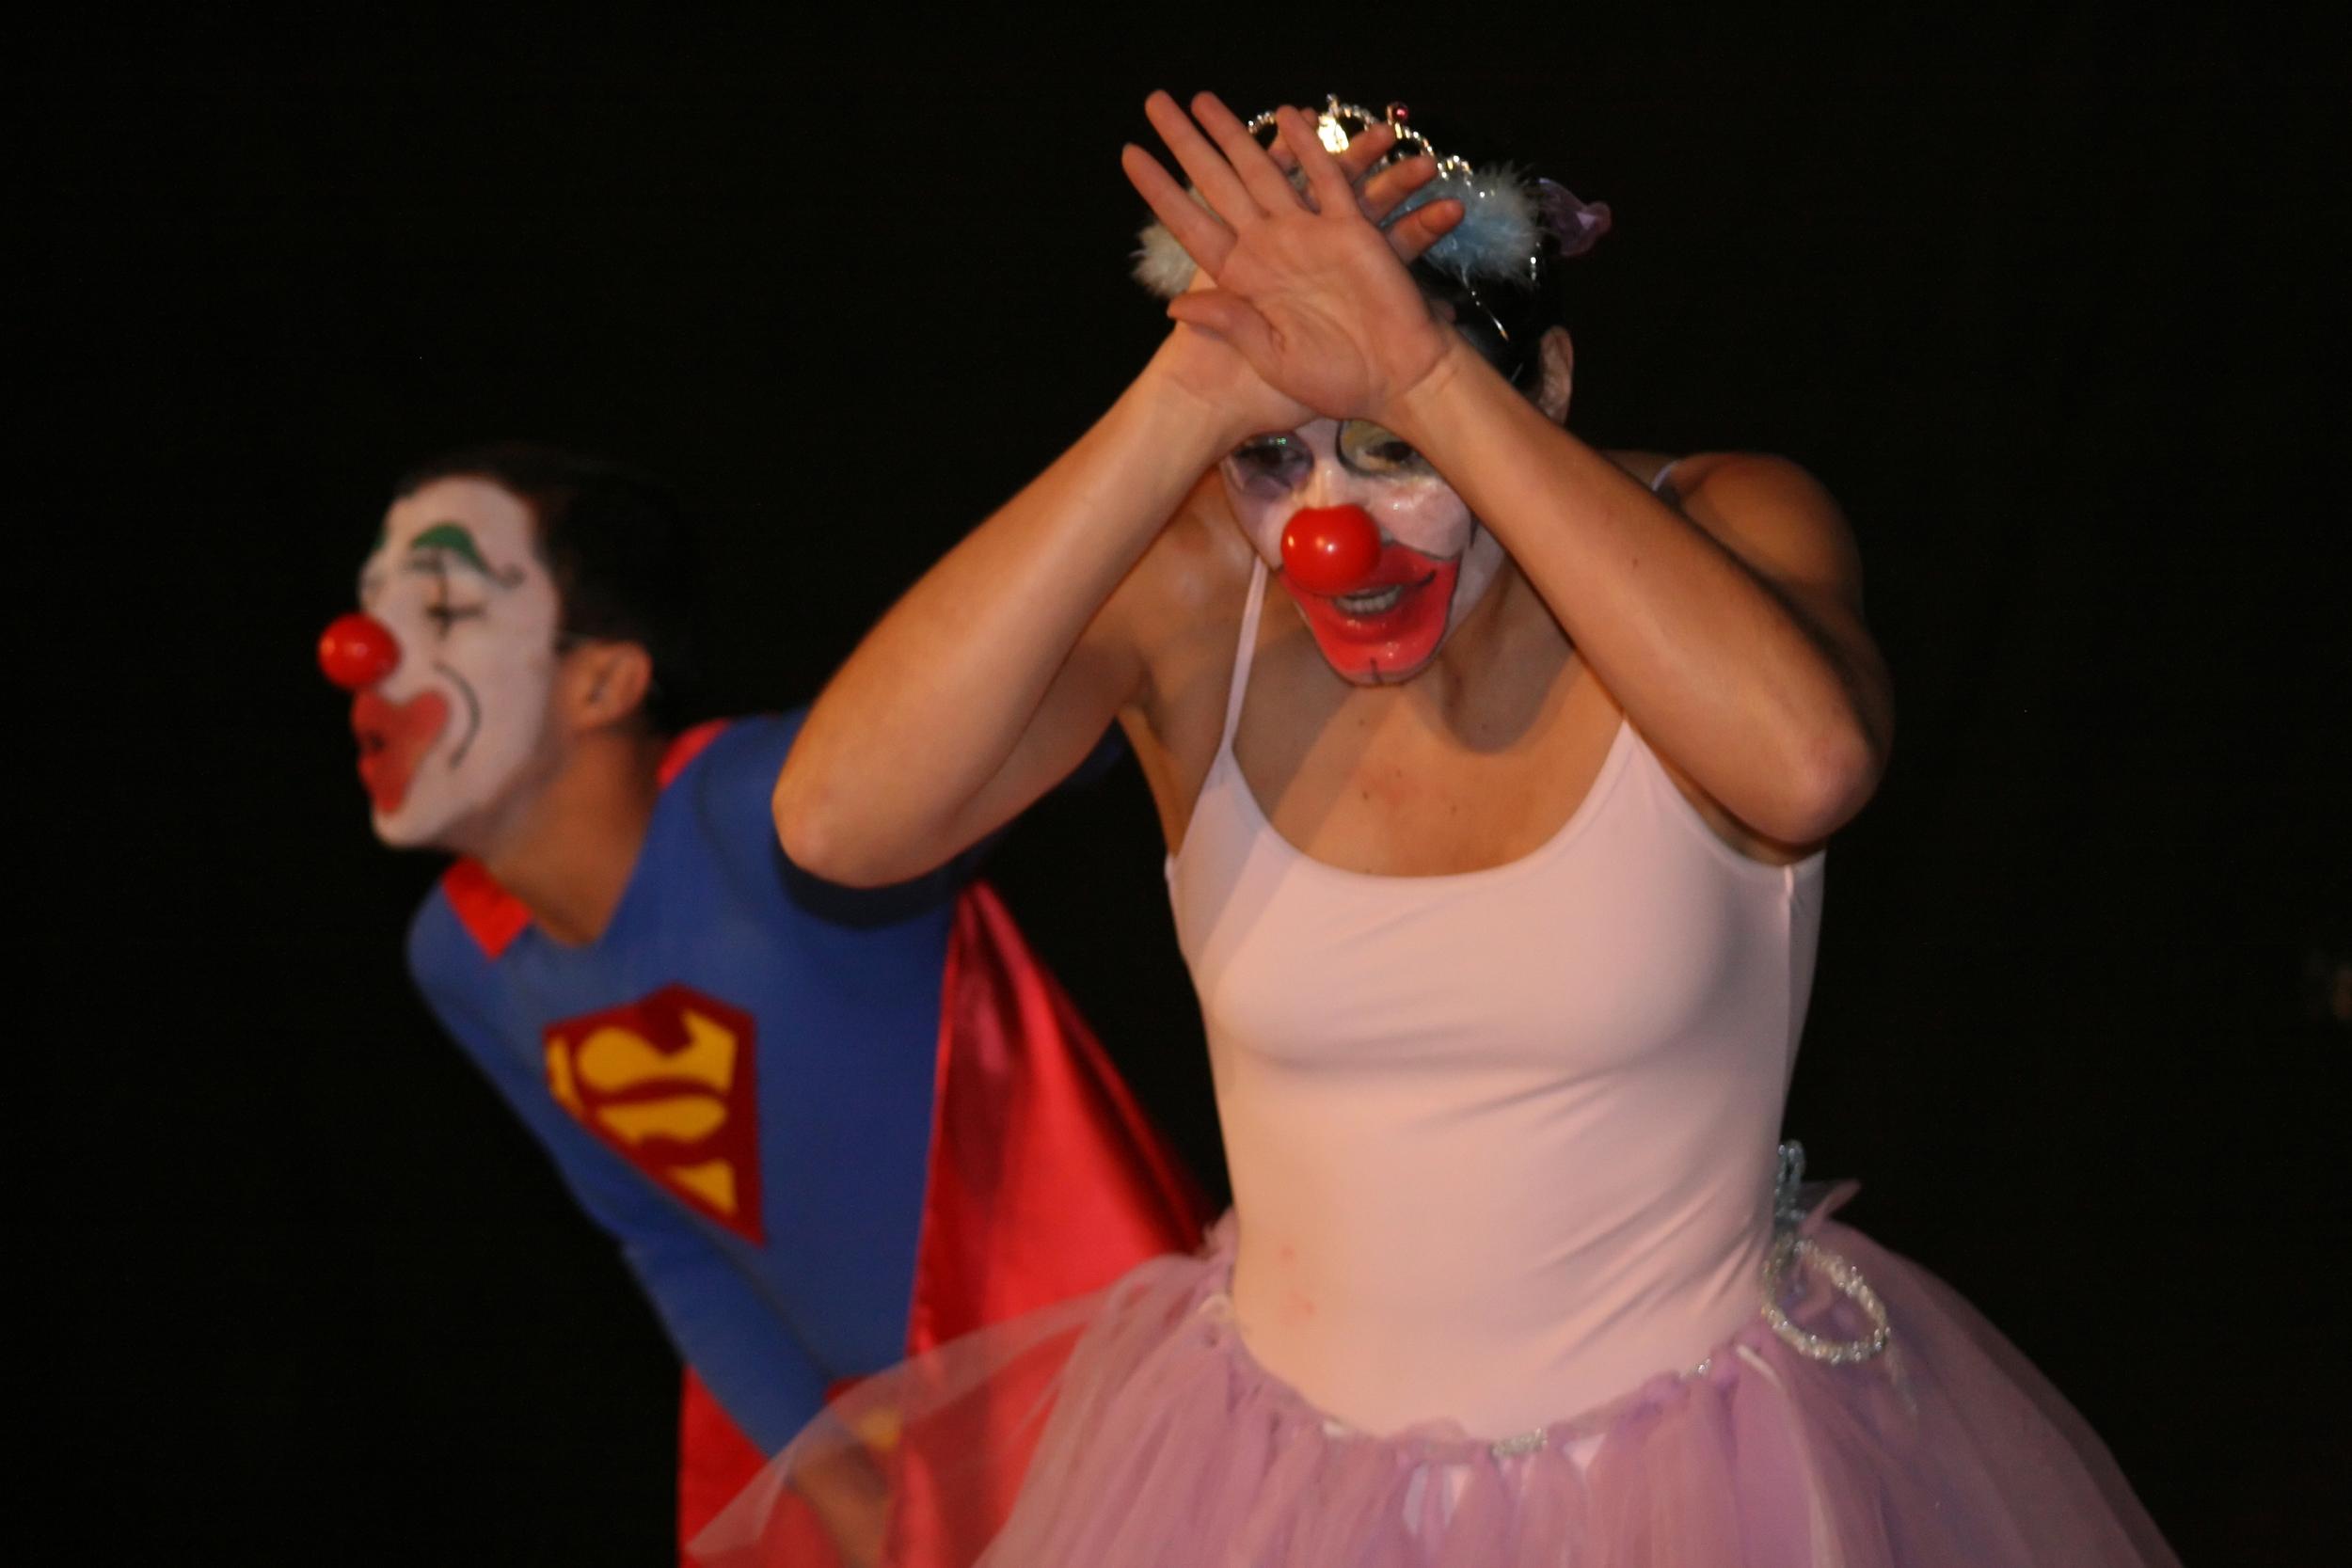 Las obras de teatro, normalmente, no se improvisan. Foto: www.rubenlaspalmas.com.